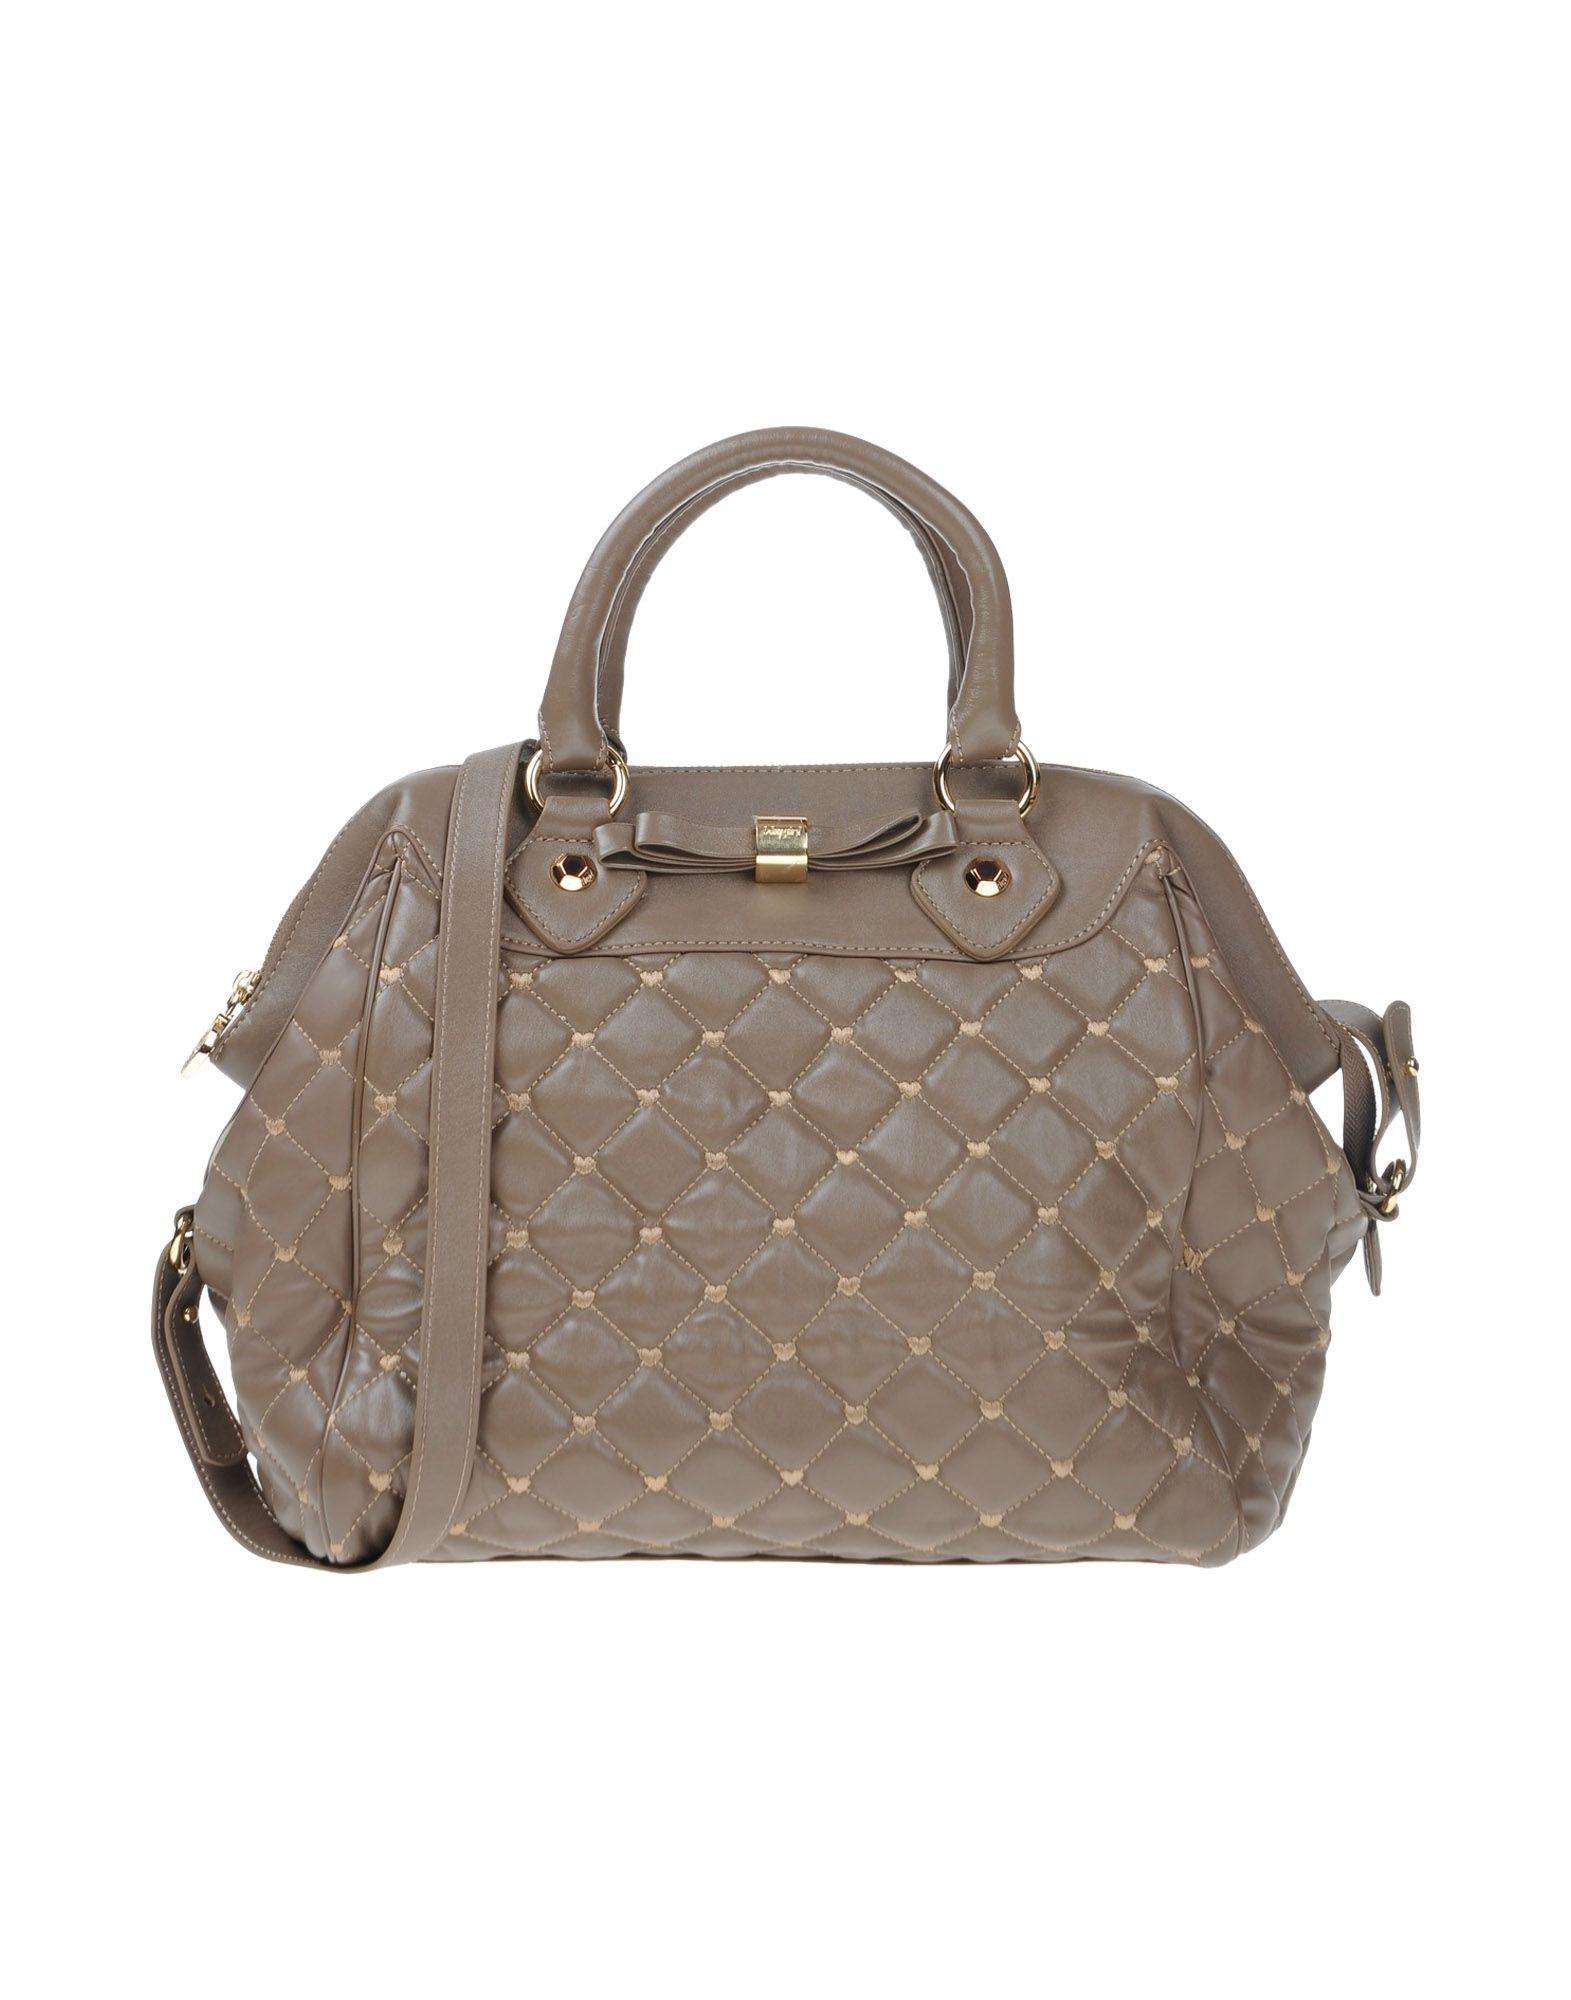 Blugirl blumarine Handbag